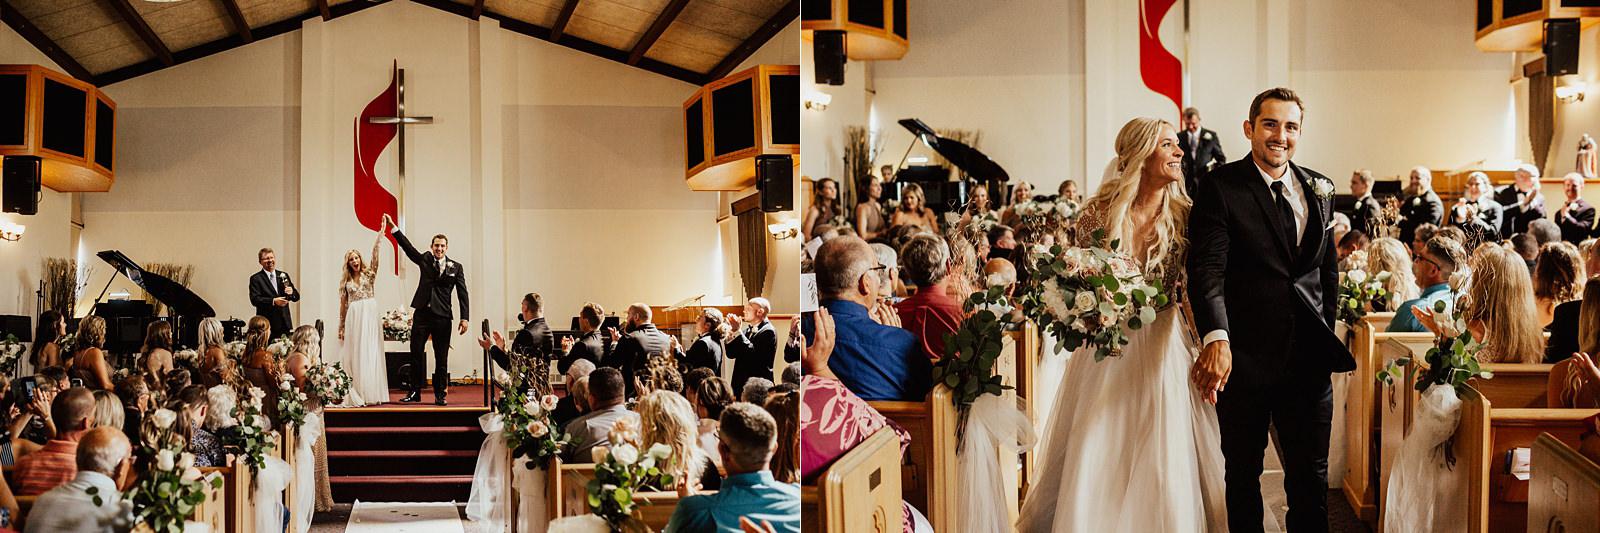 Molly & Bradley Modern Boho Wedding at The University Club Quad Cities-32.jpg